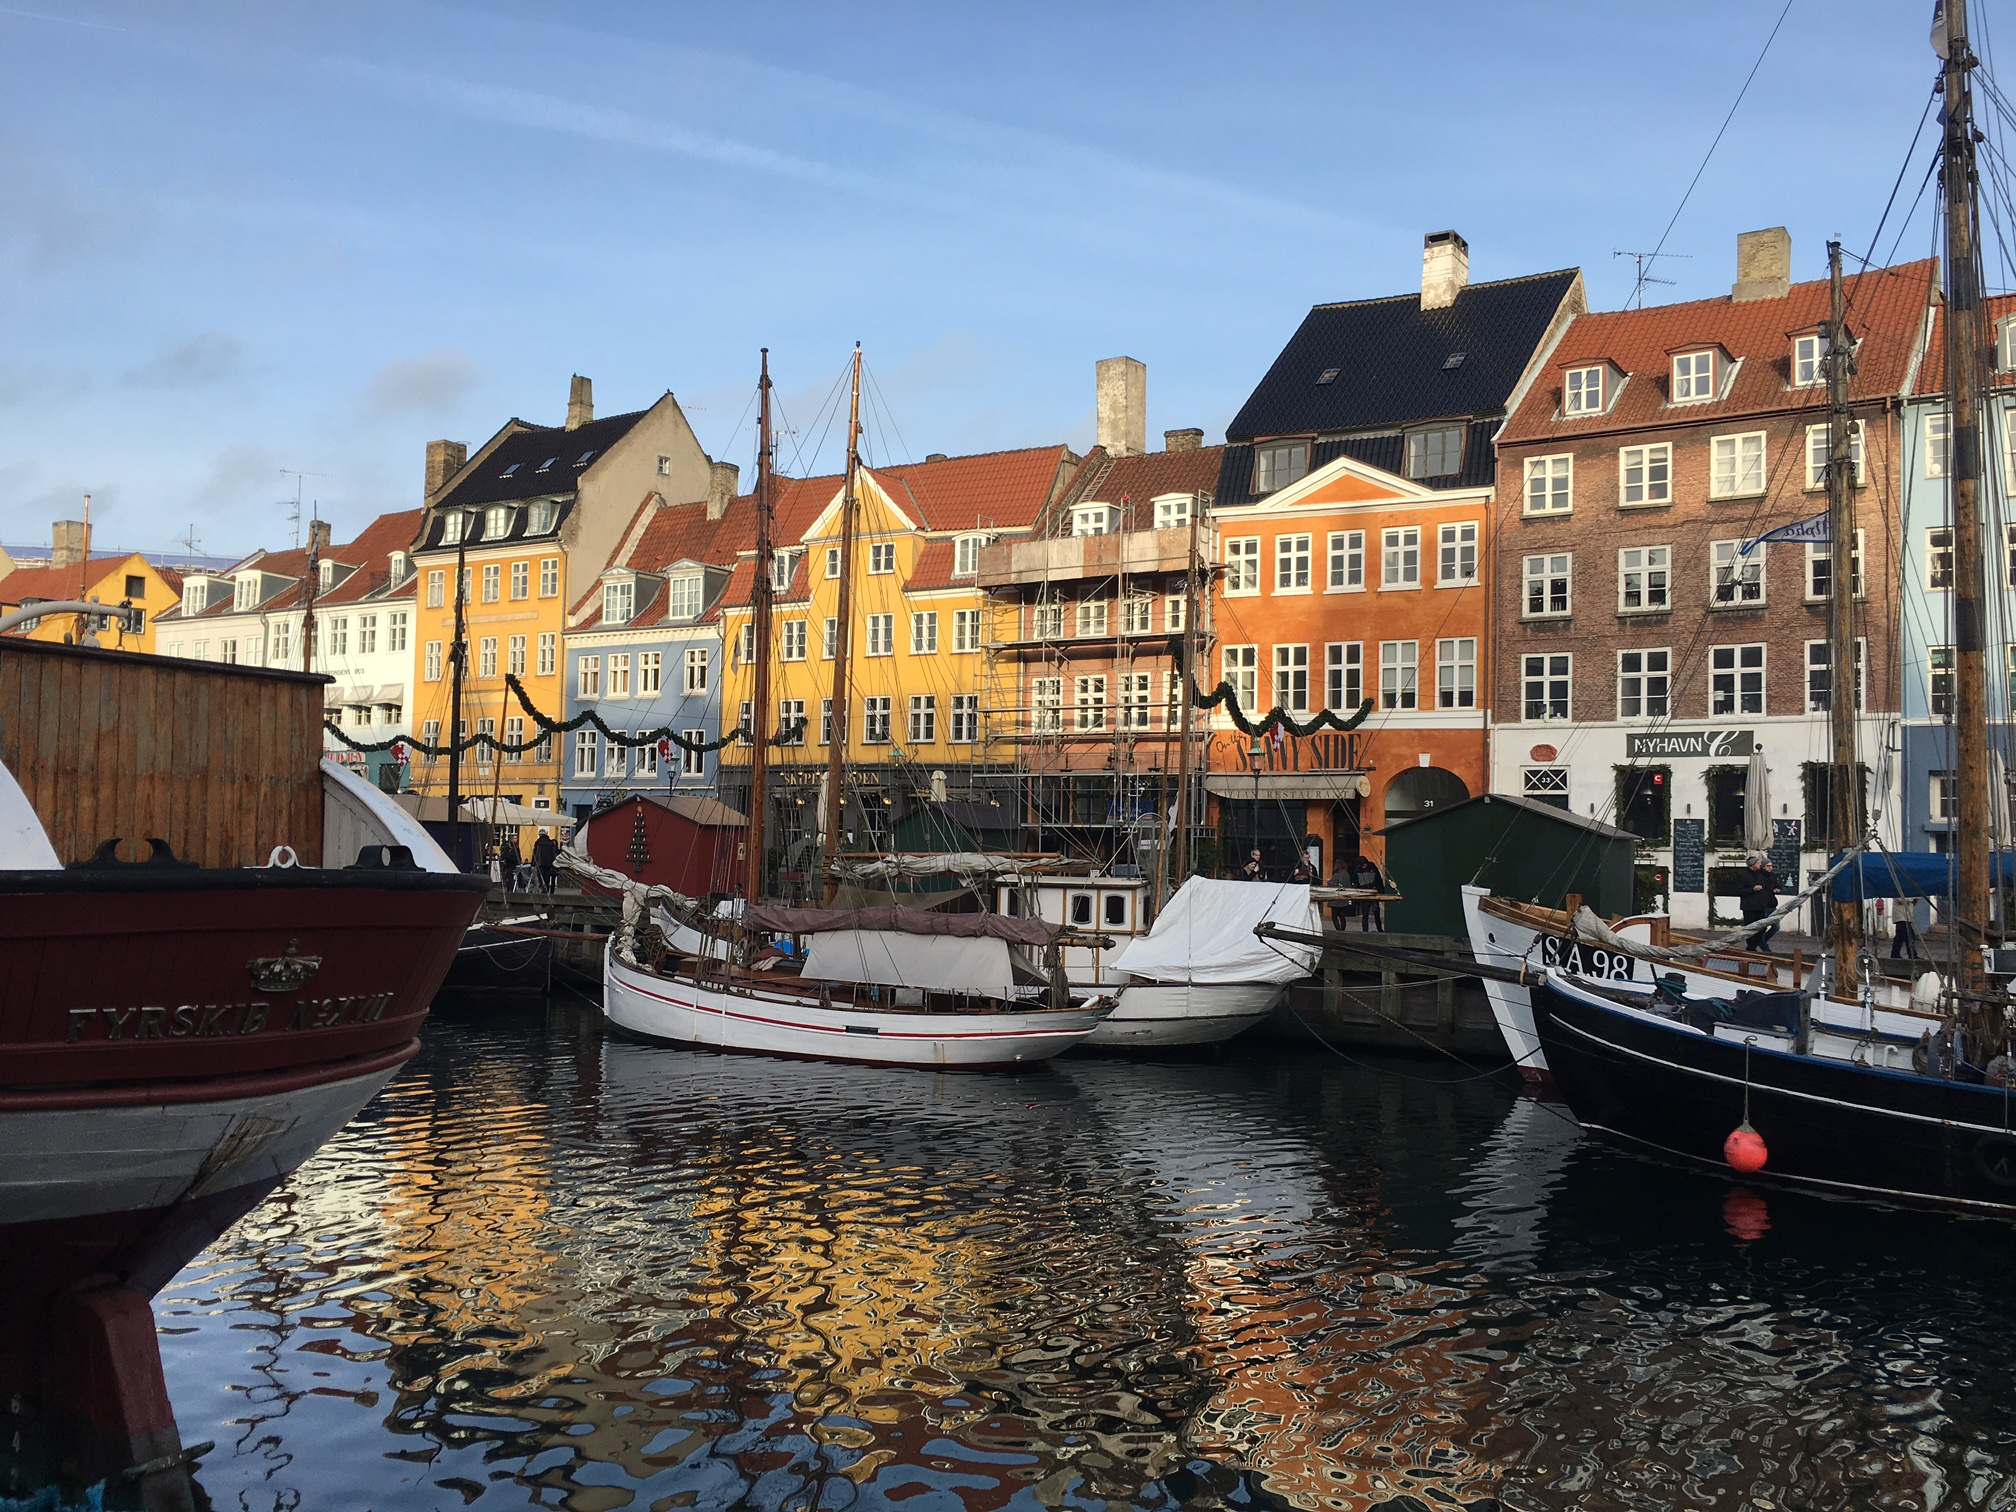 Postcard perfect - Nyhavn